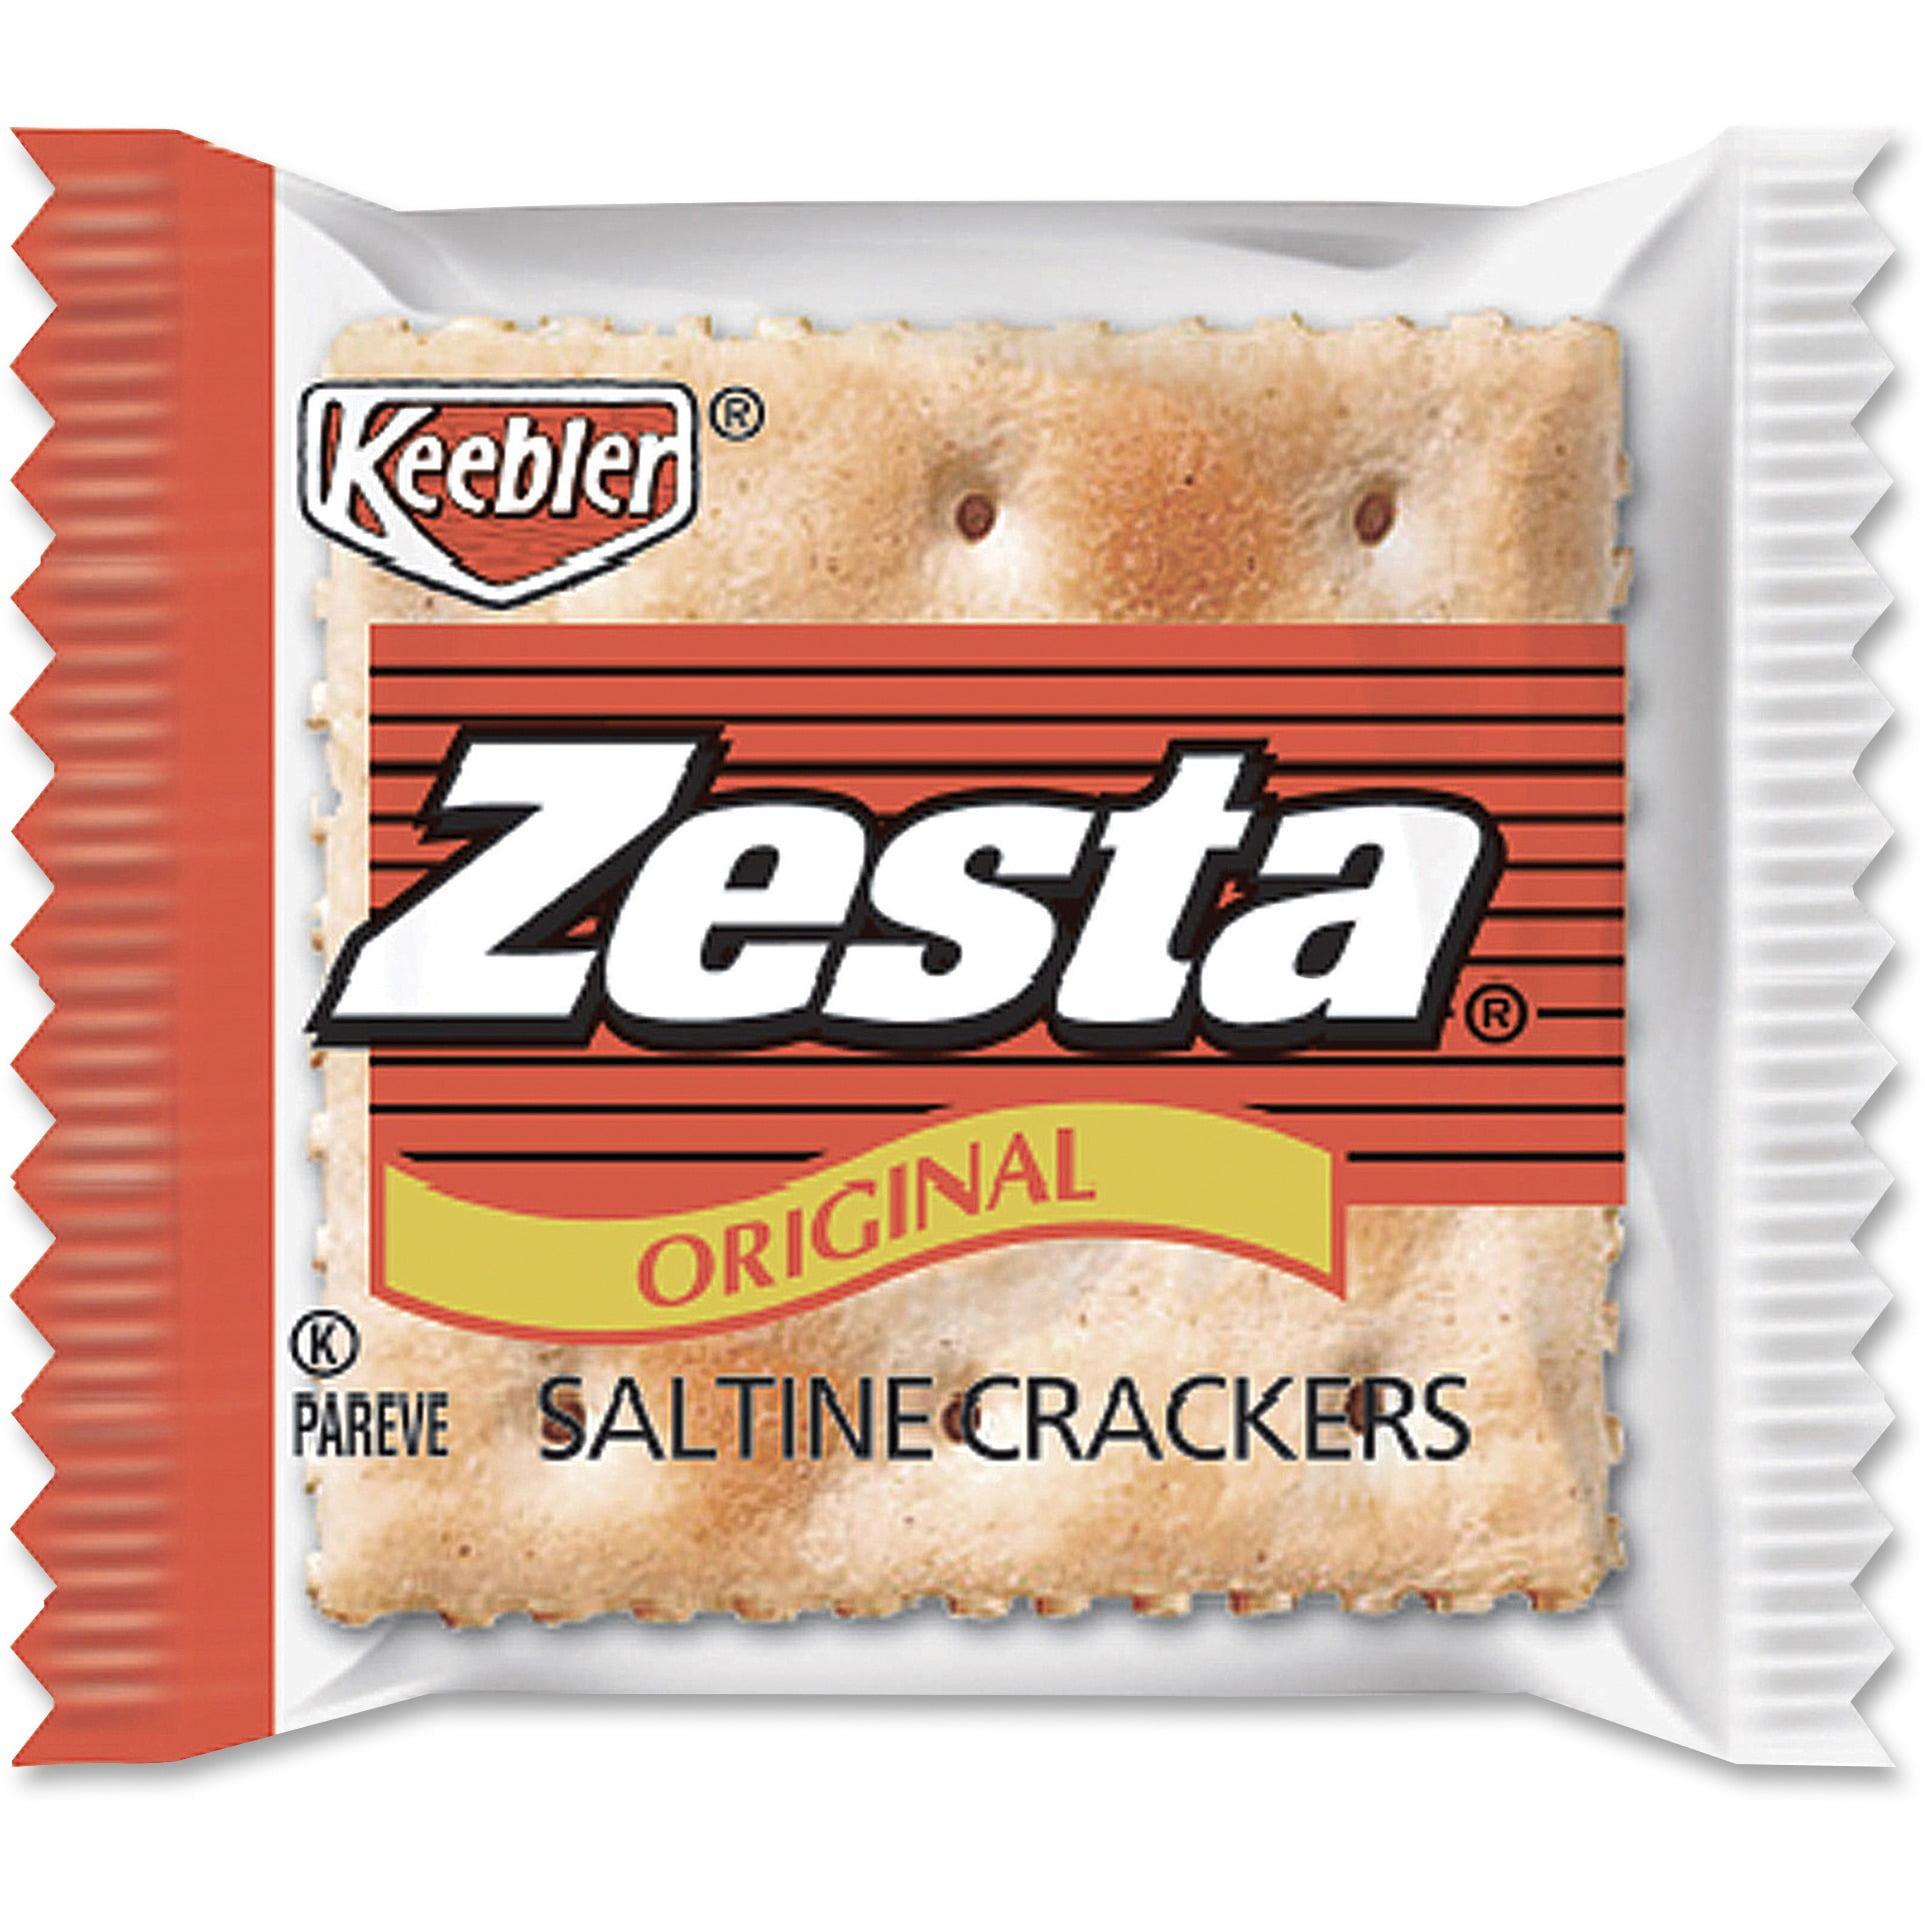 Keebler, KEB00646, Zesta Saltine Crackers Packets, 300 / Carton